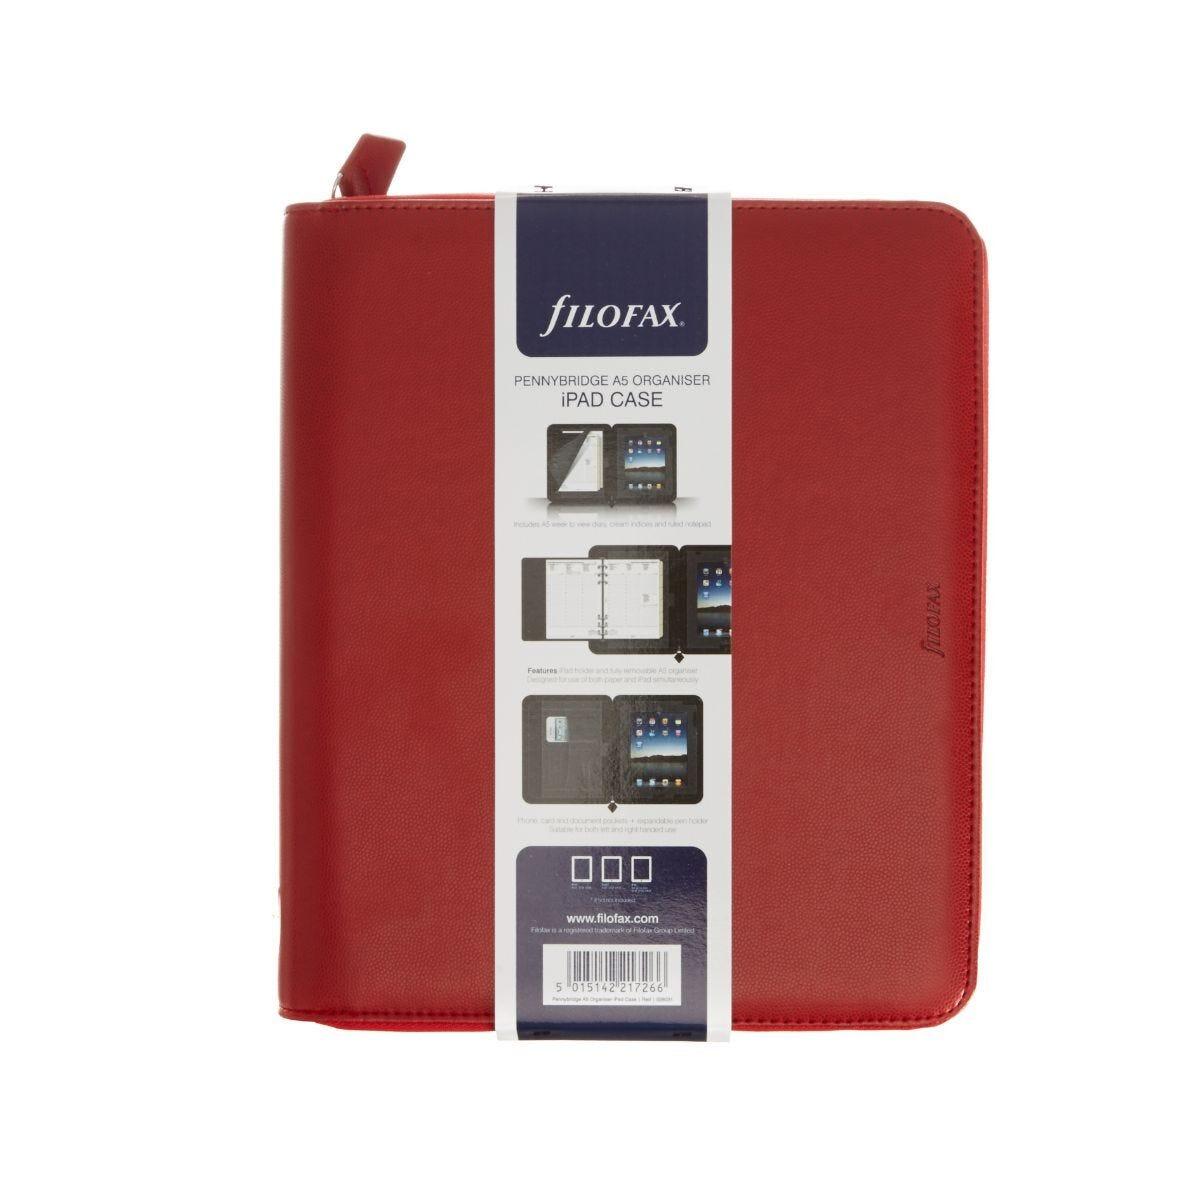 Filofax Pennybridge A5 Organiser with iPad Holder Red